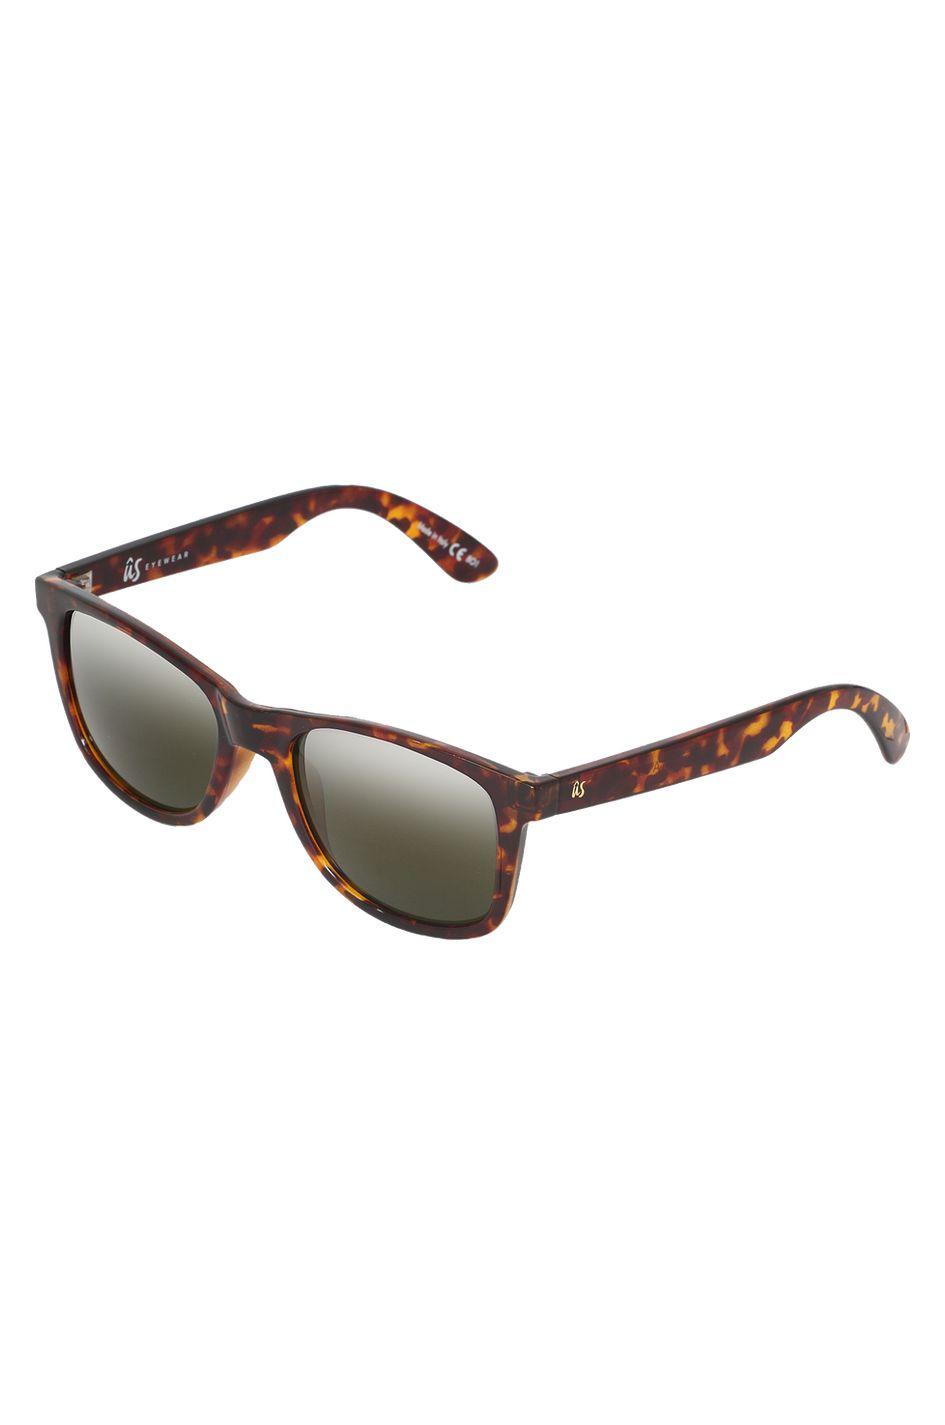 Oculos US MATY Gloss Tort/Vintage Grey Polarized